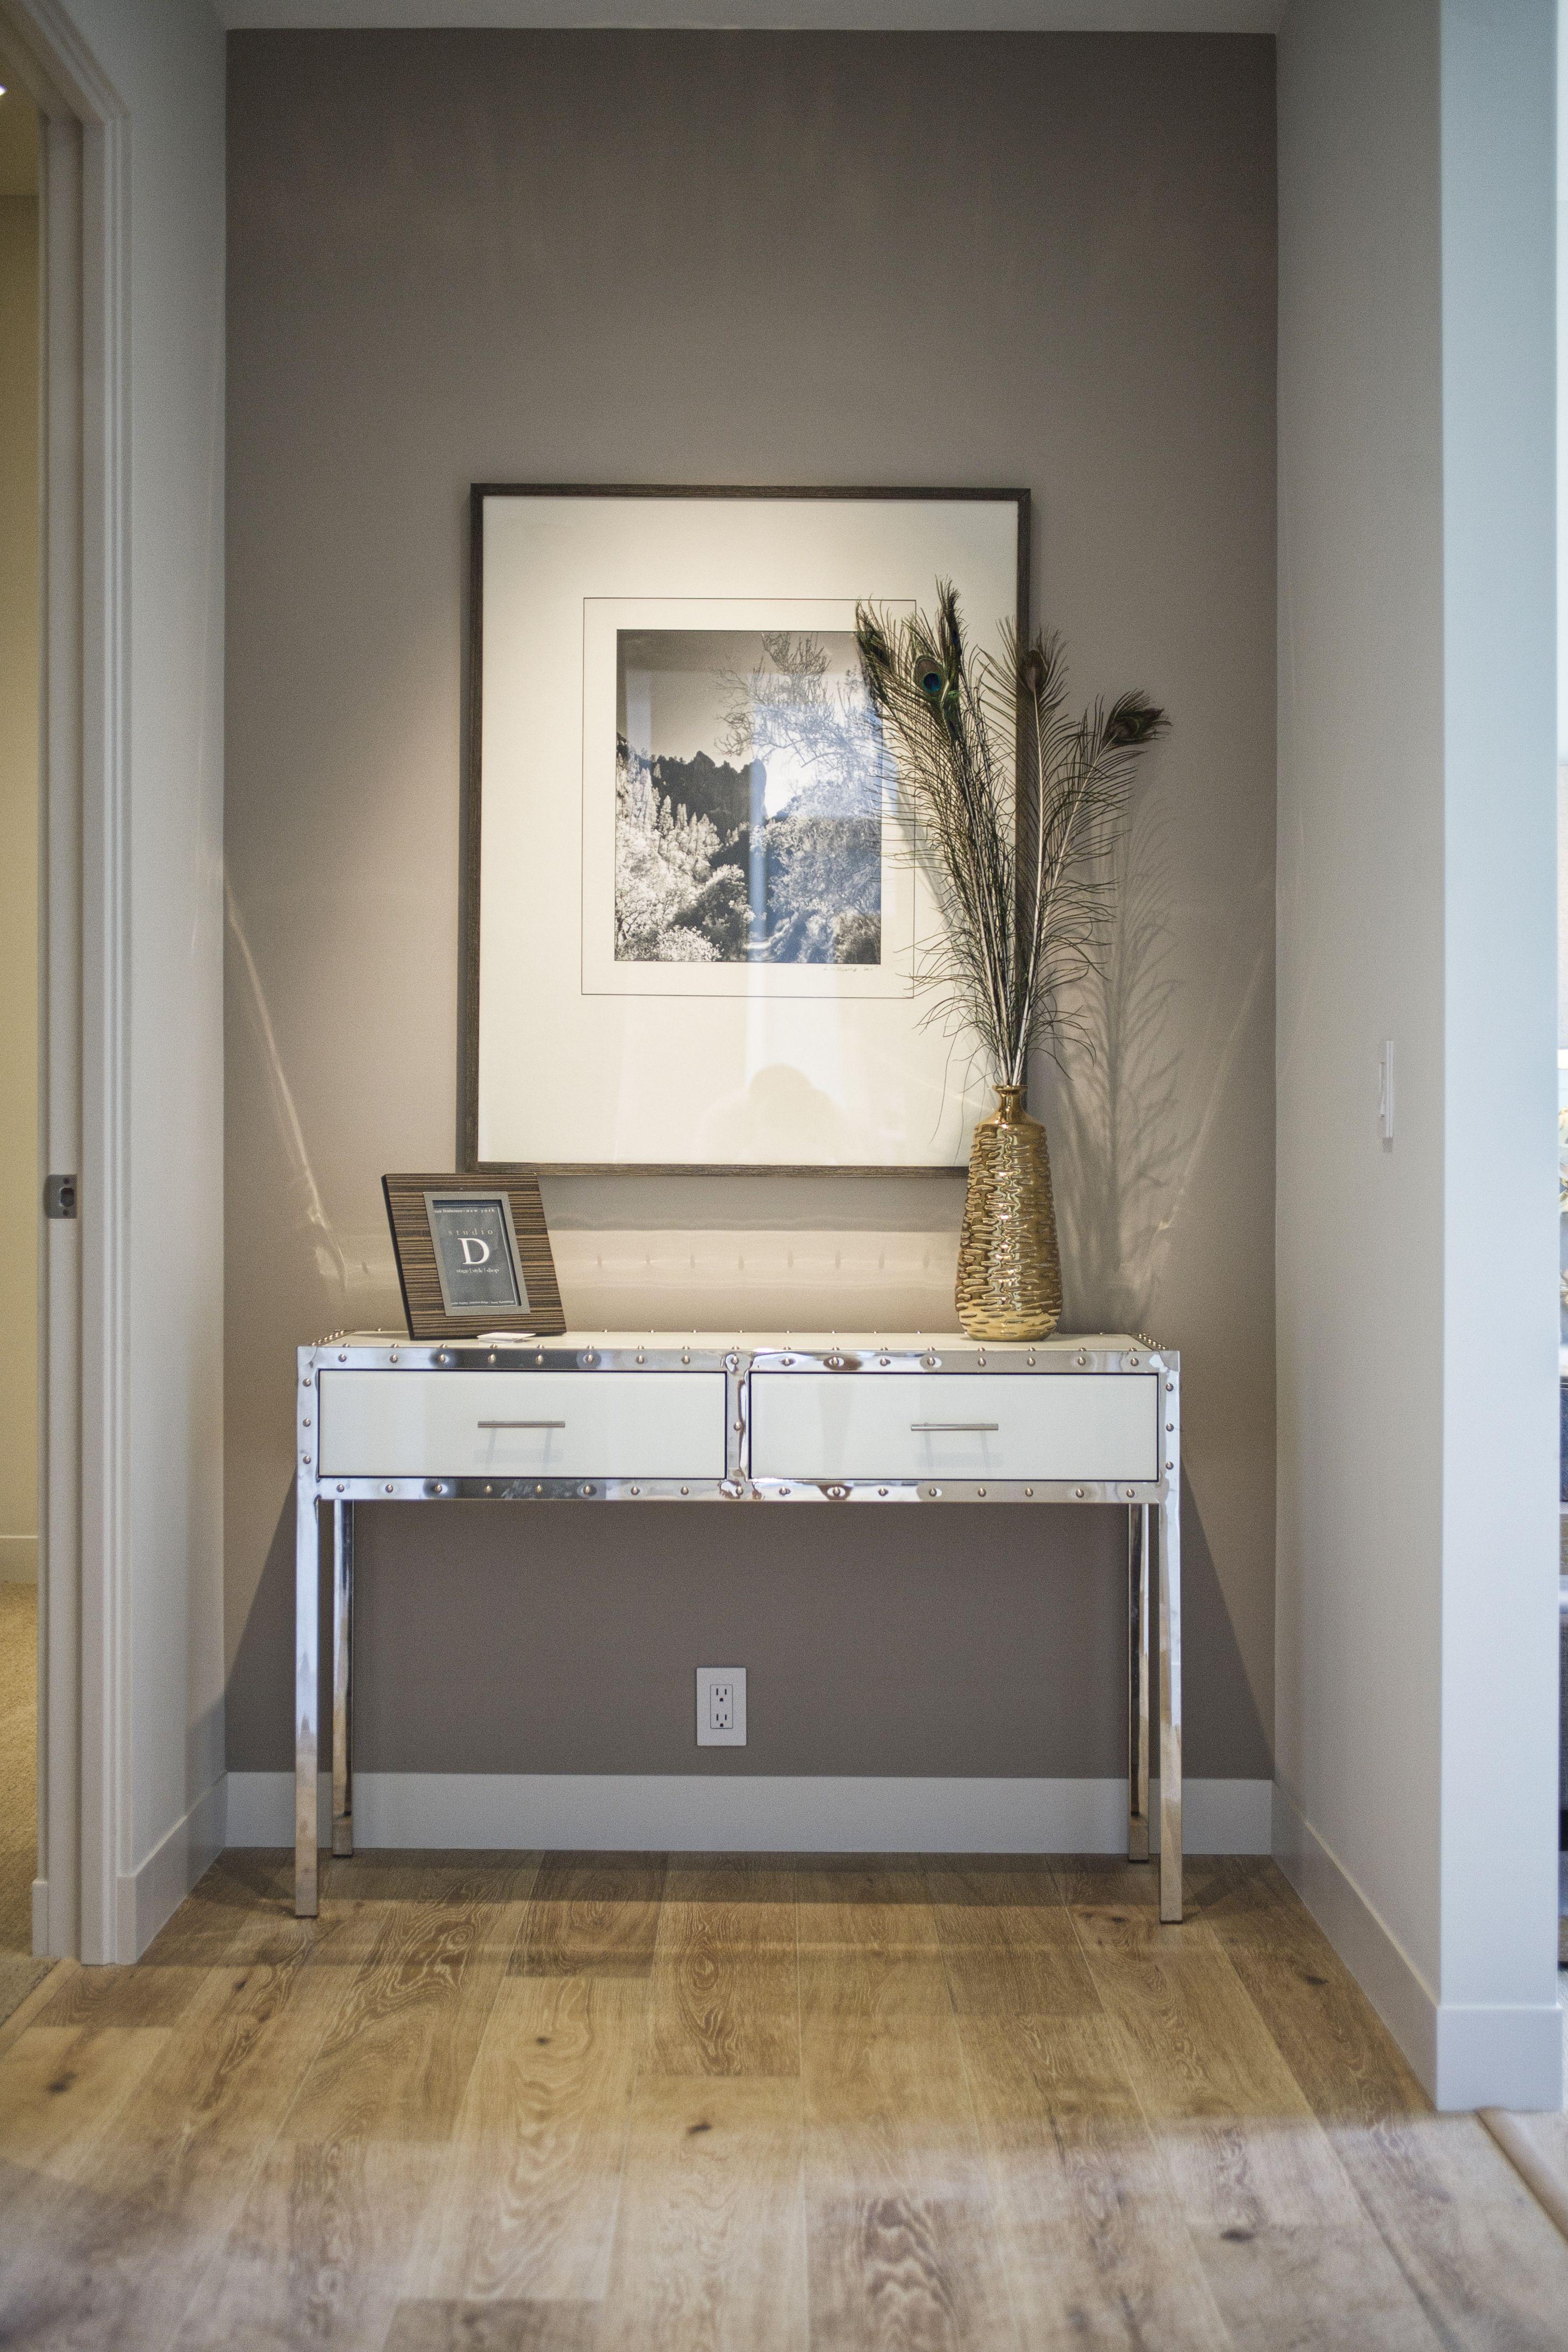 Redecorate My Living Room: Best Living Room Design